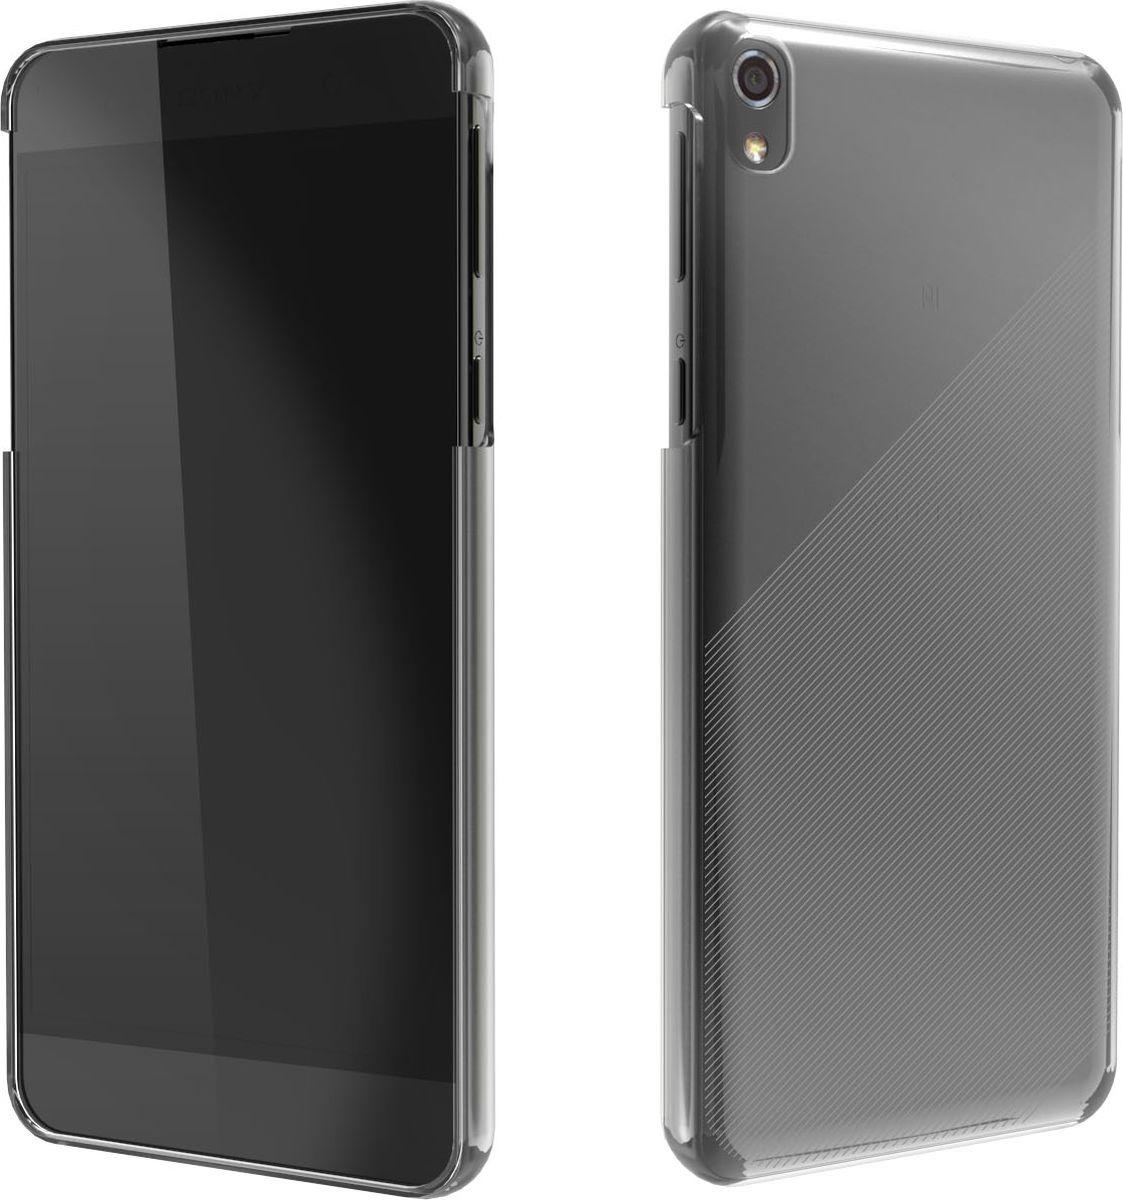 Чехол для сотового телефона Muvit MFX Crystal Case для Sony Xperia E5, SECRY0007, прозрачный